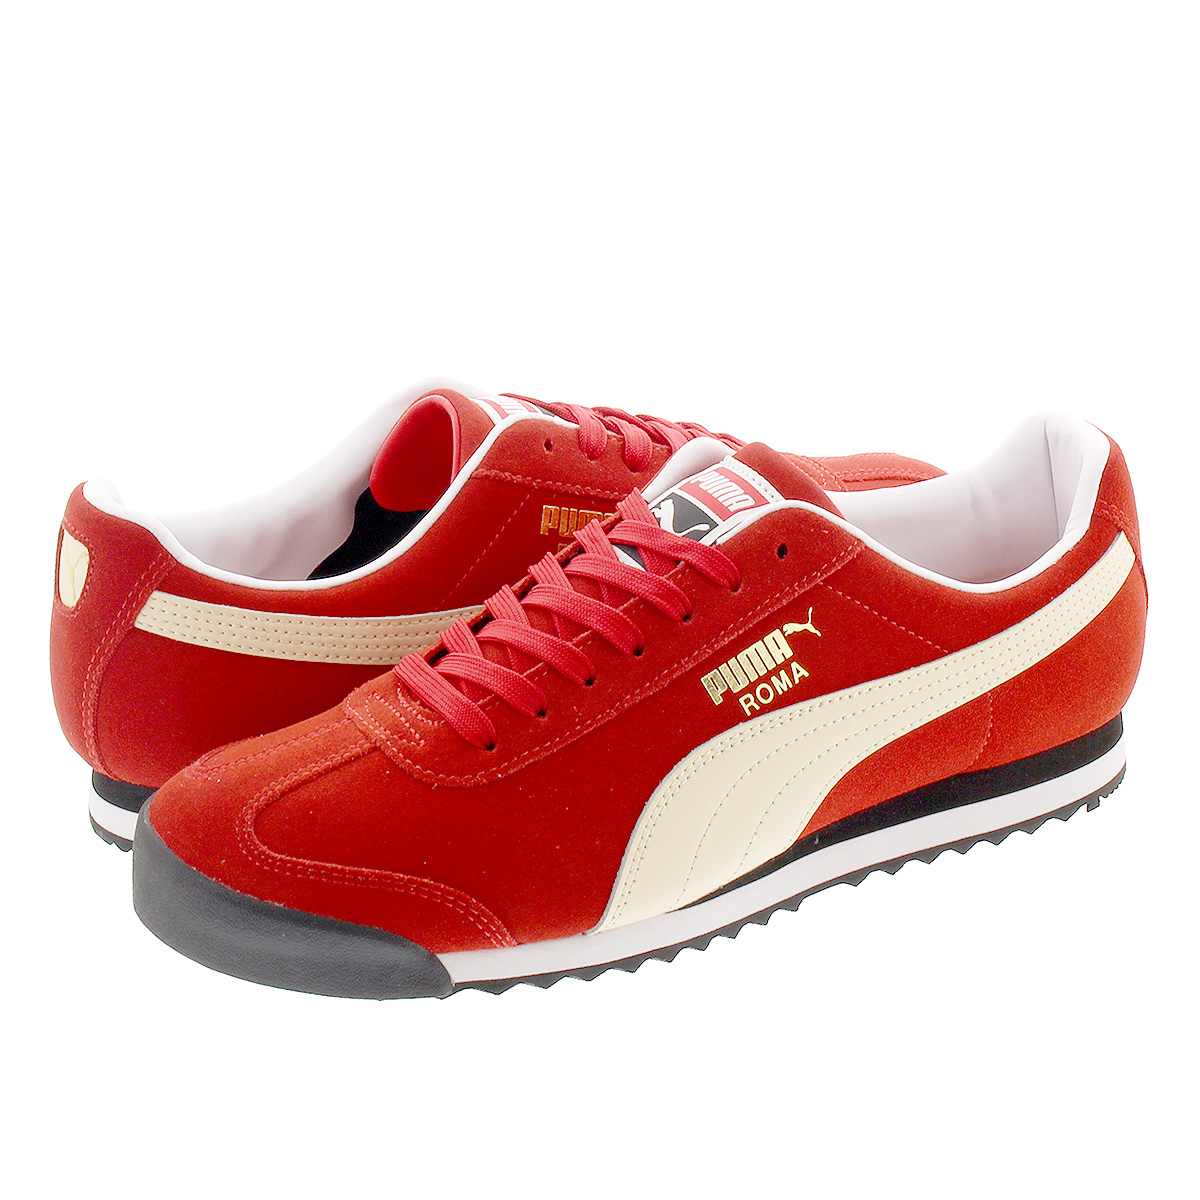 super popular 2aa80 dc4c0 PUMA ROMA SUEDE Puma Lomas aide HIGH RISK RED/SUMMER MELON 365,437-13